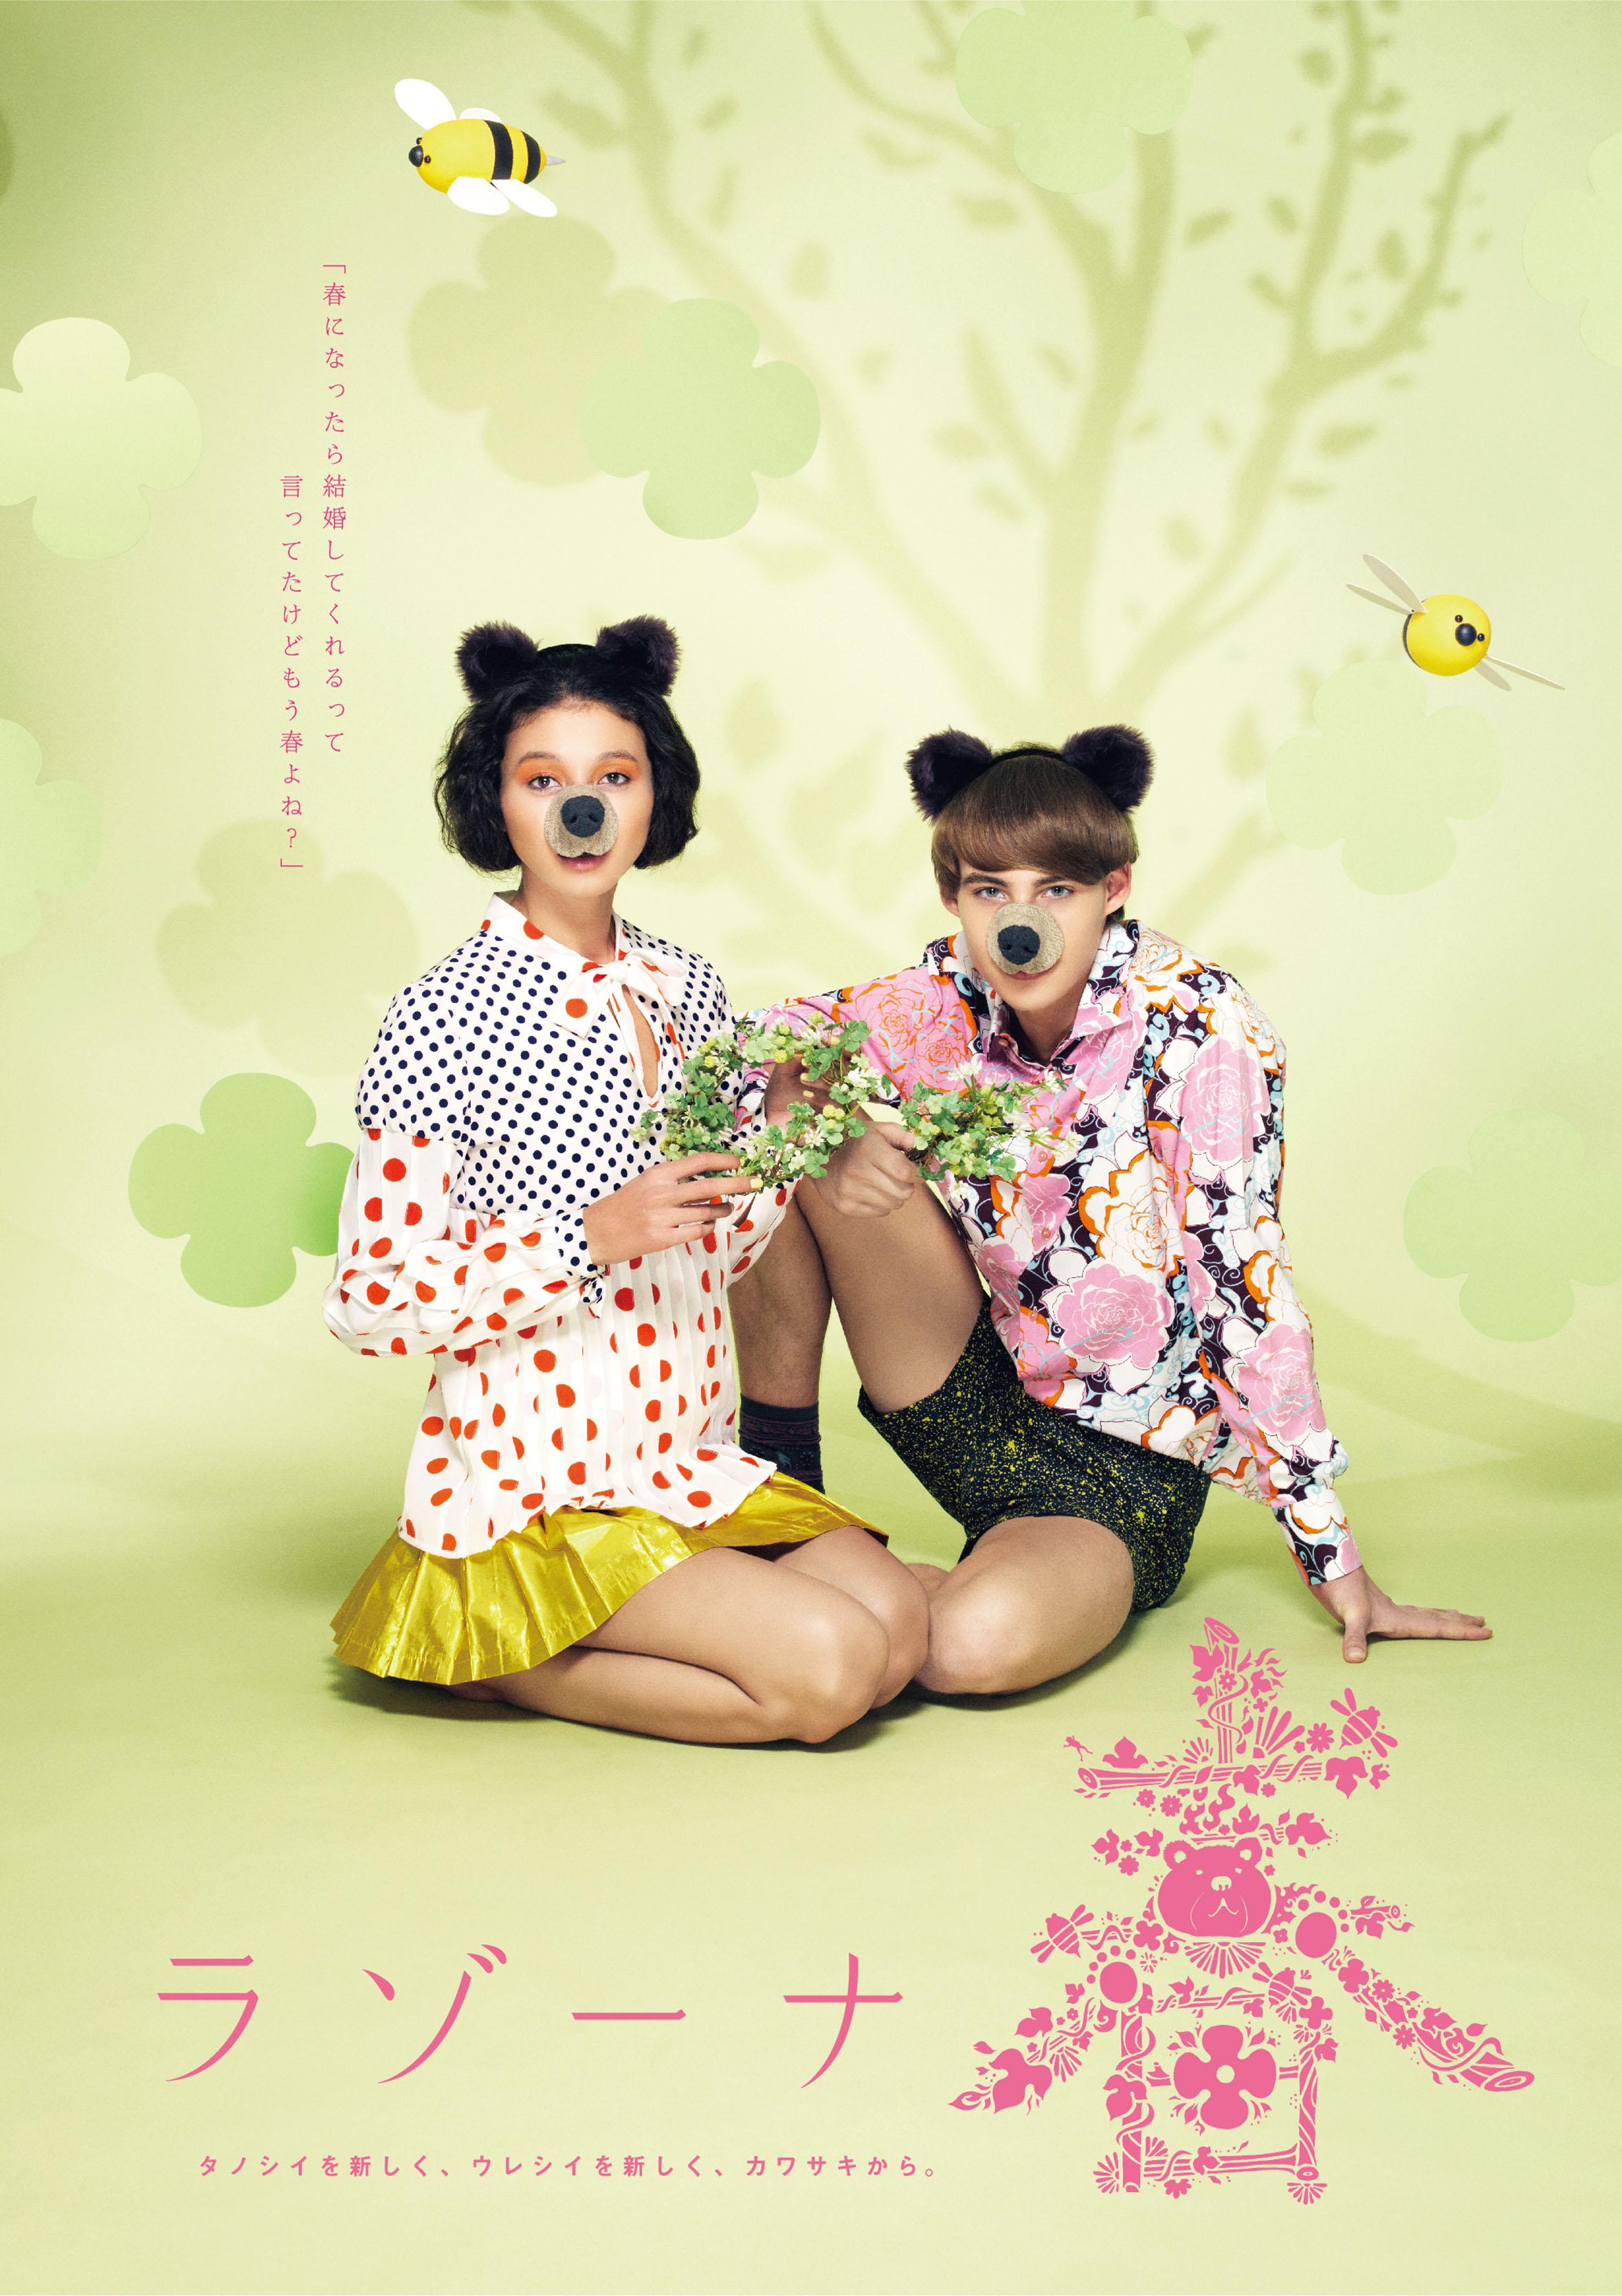 B1_poster_Spring_B1_入稿